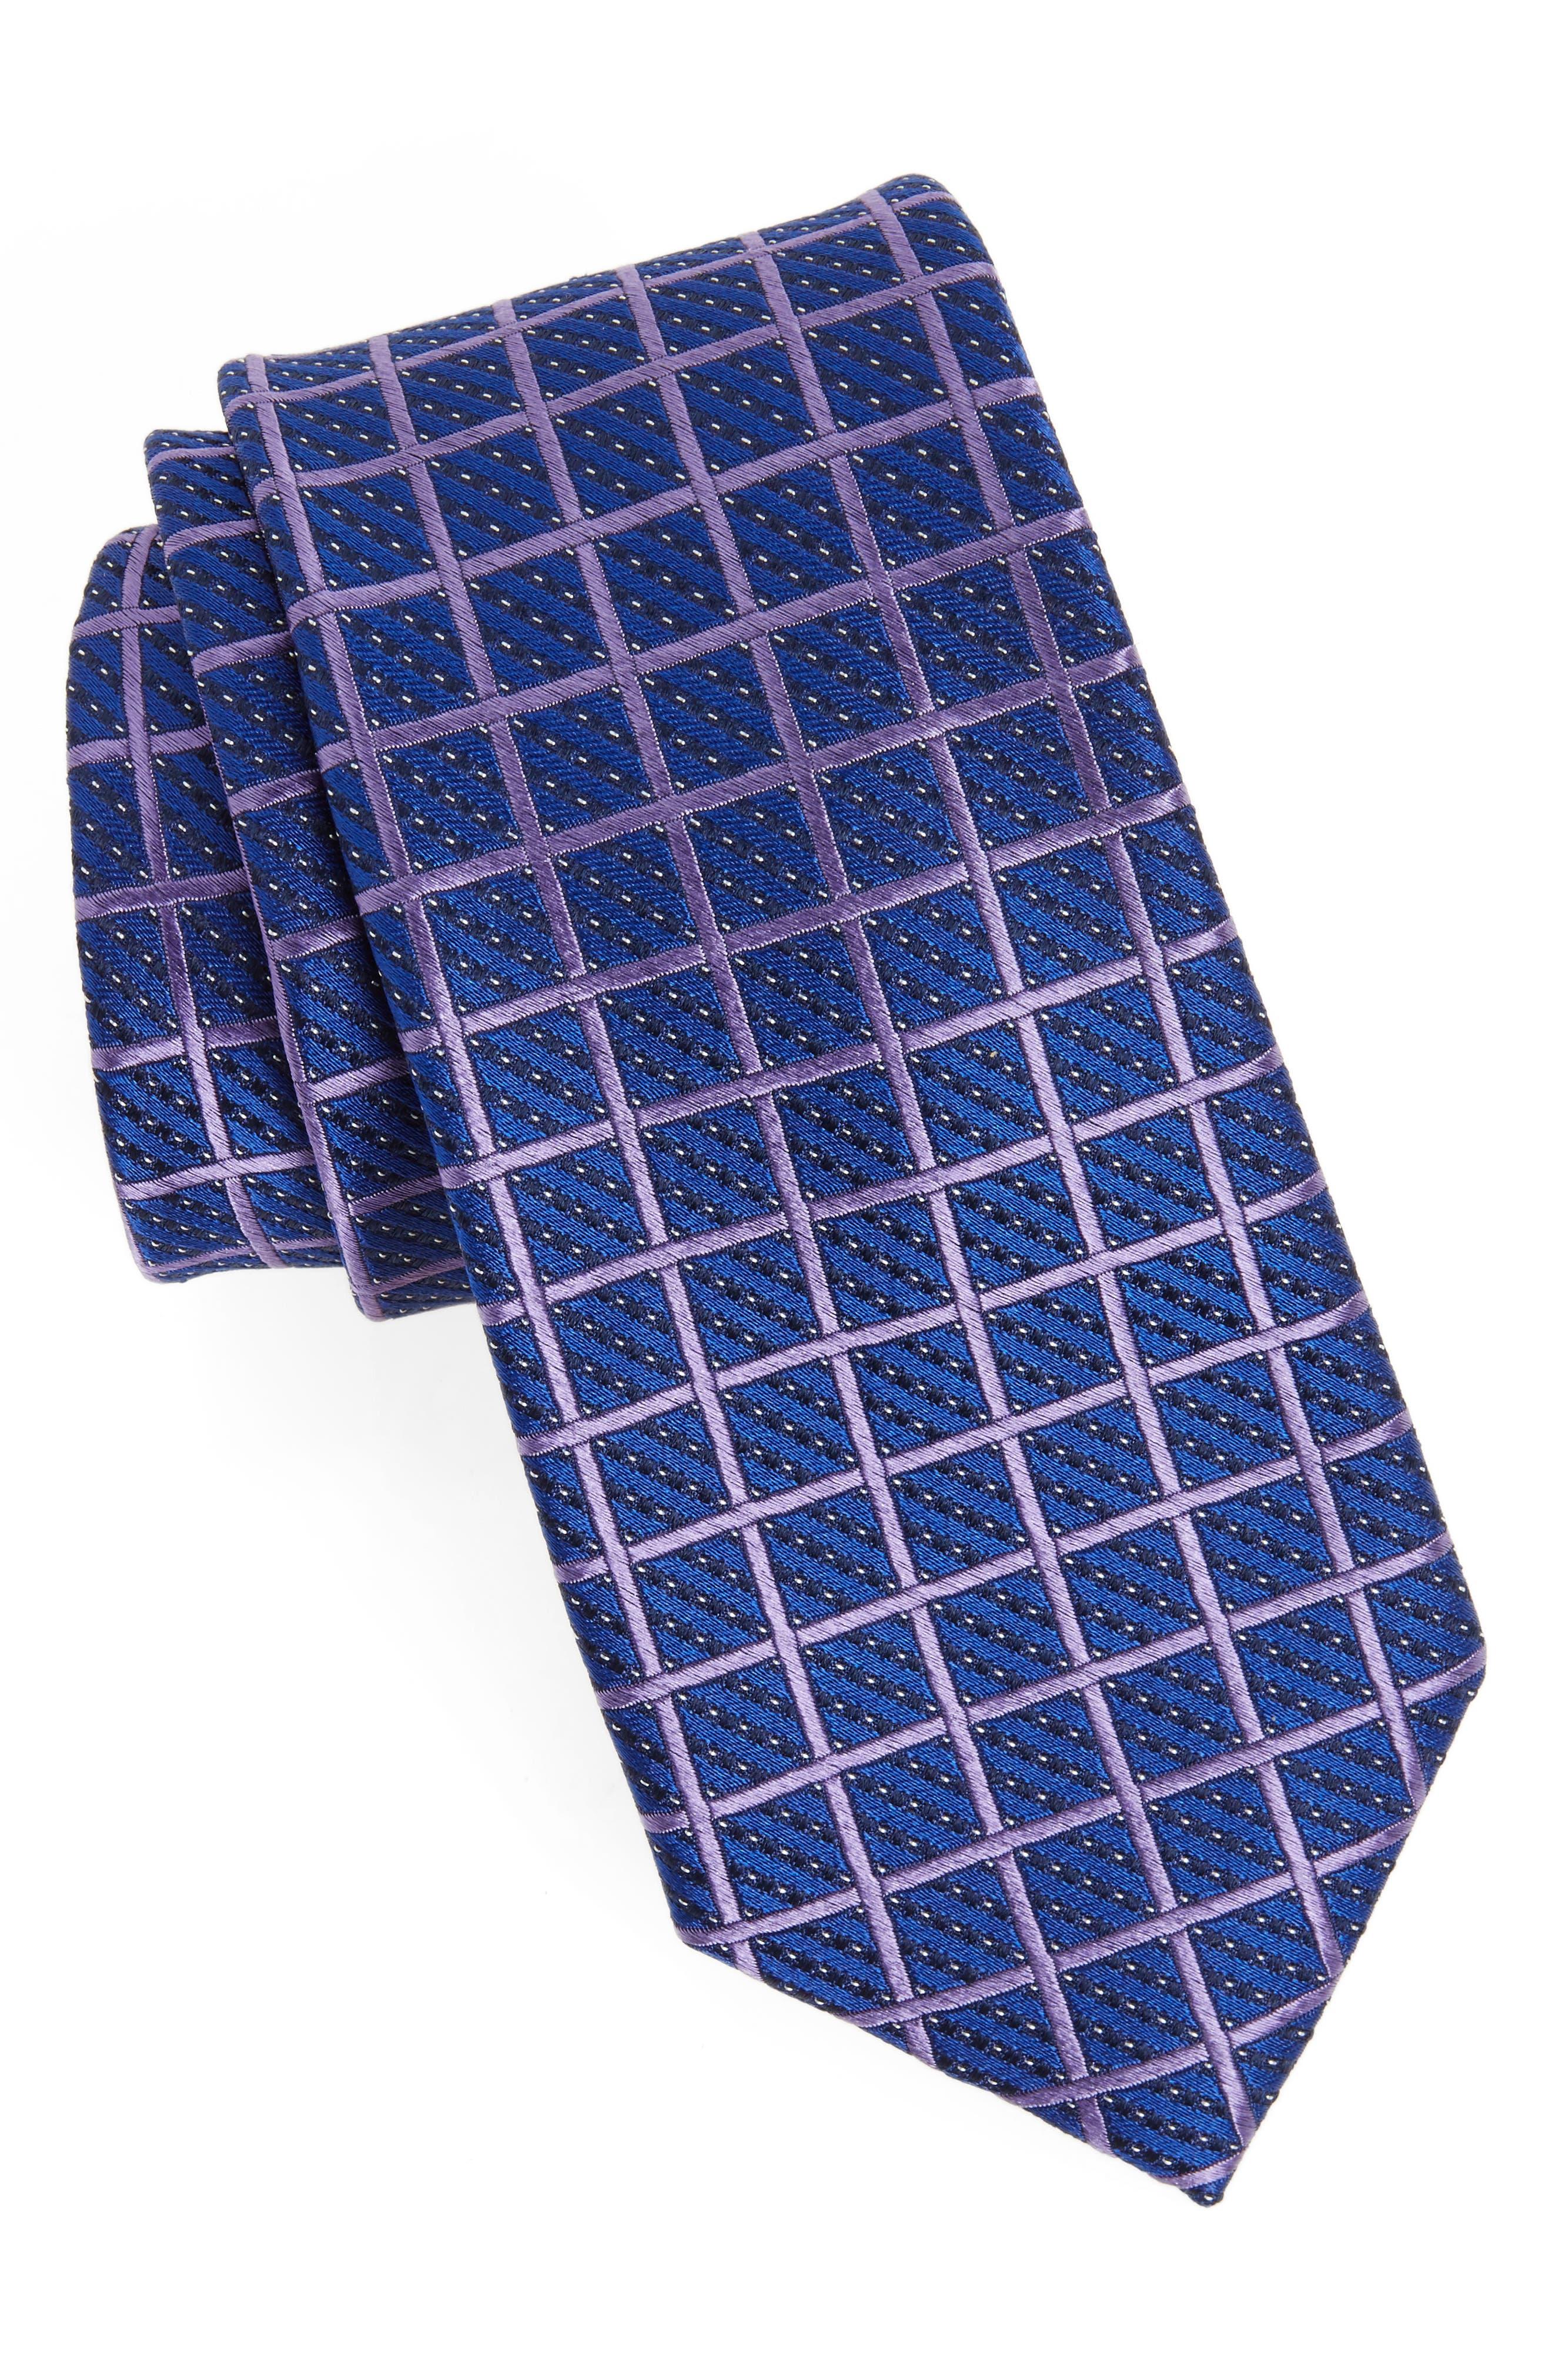 Alternate Image 1 Selected - Nordstrom Men's Shop Tattersall Silk Tie